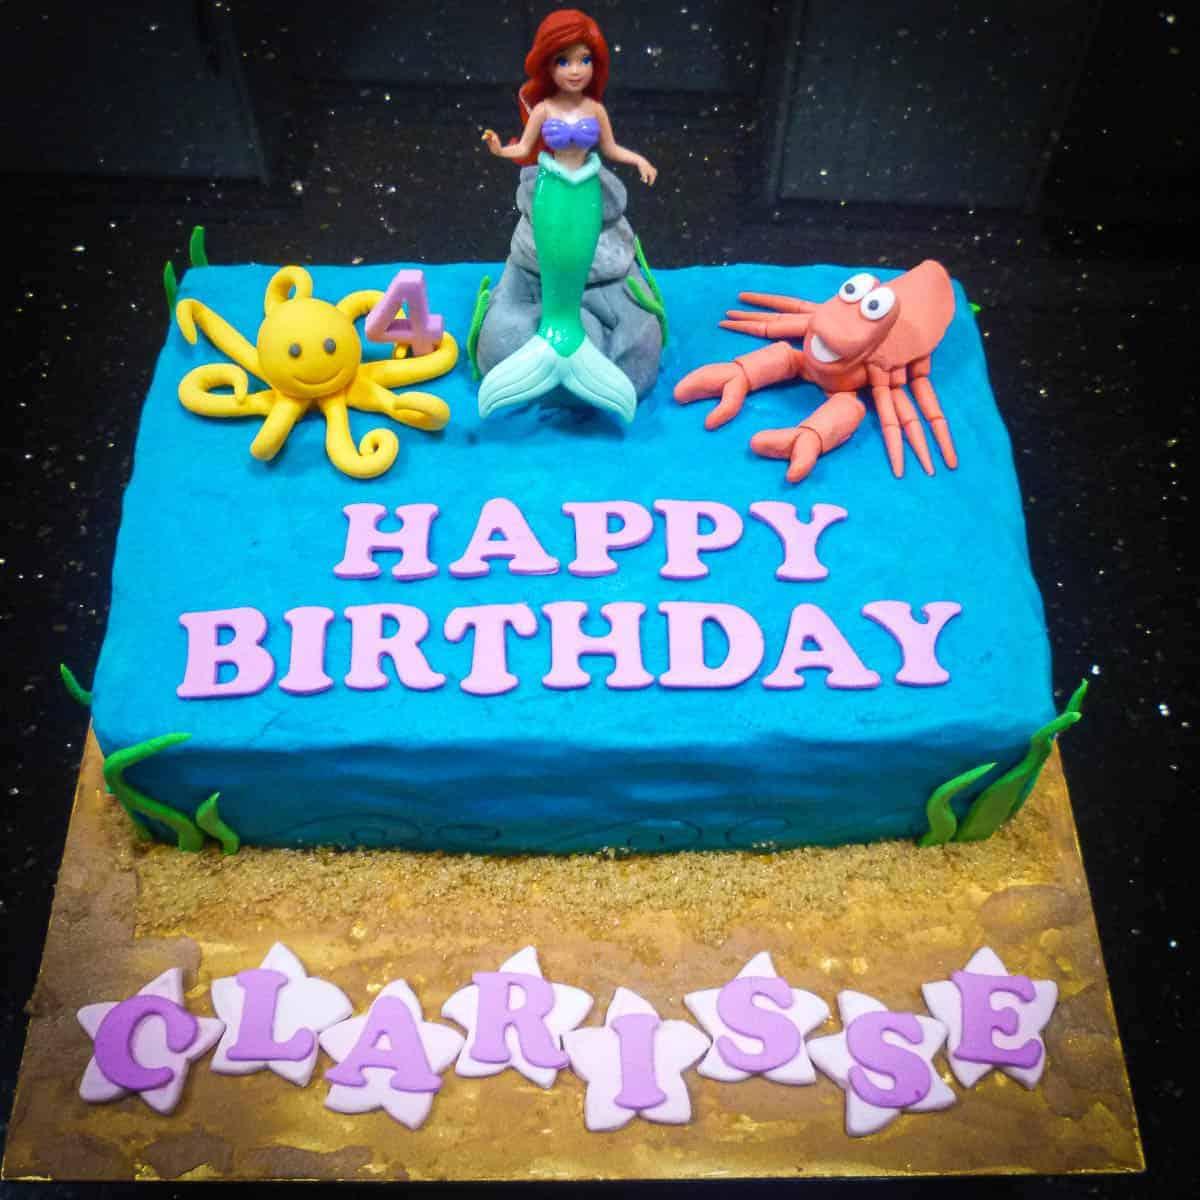 Little Mermaid Birthday Cake A Decorating Tutorial Decorated Treats